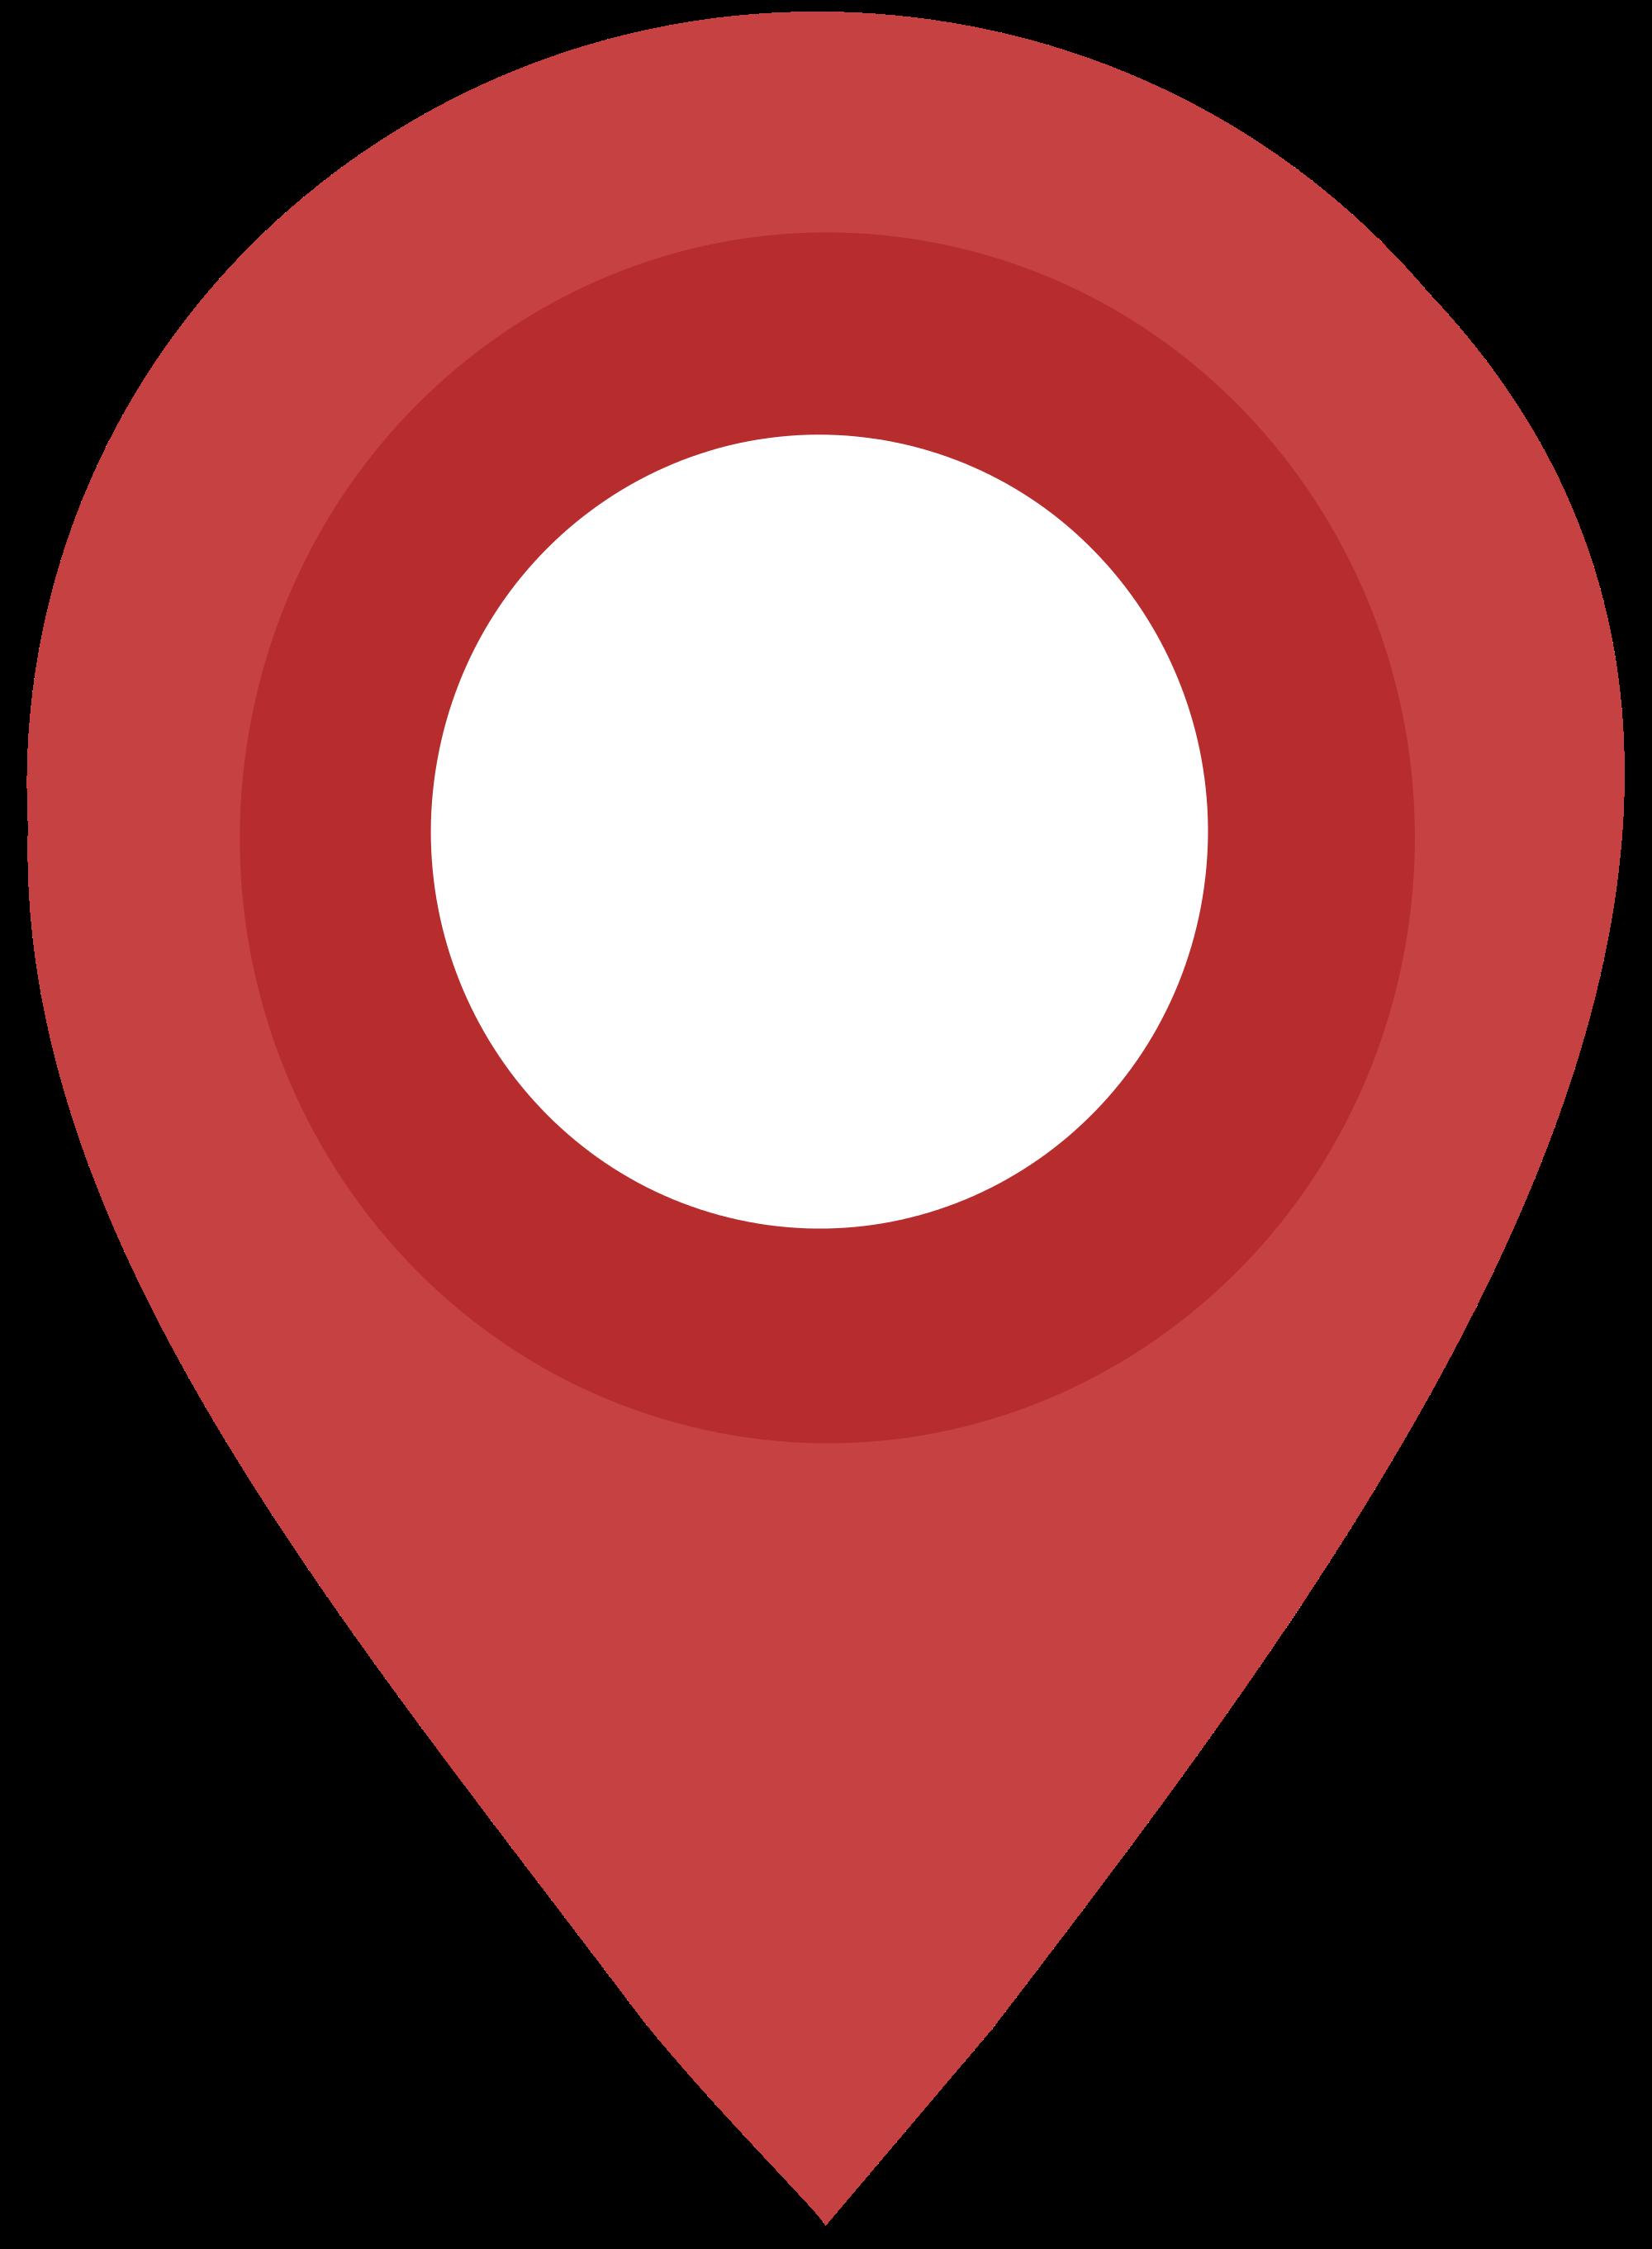 Google Maps Pin Vector at GetDrawings.com.